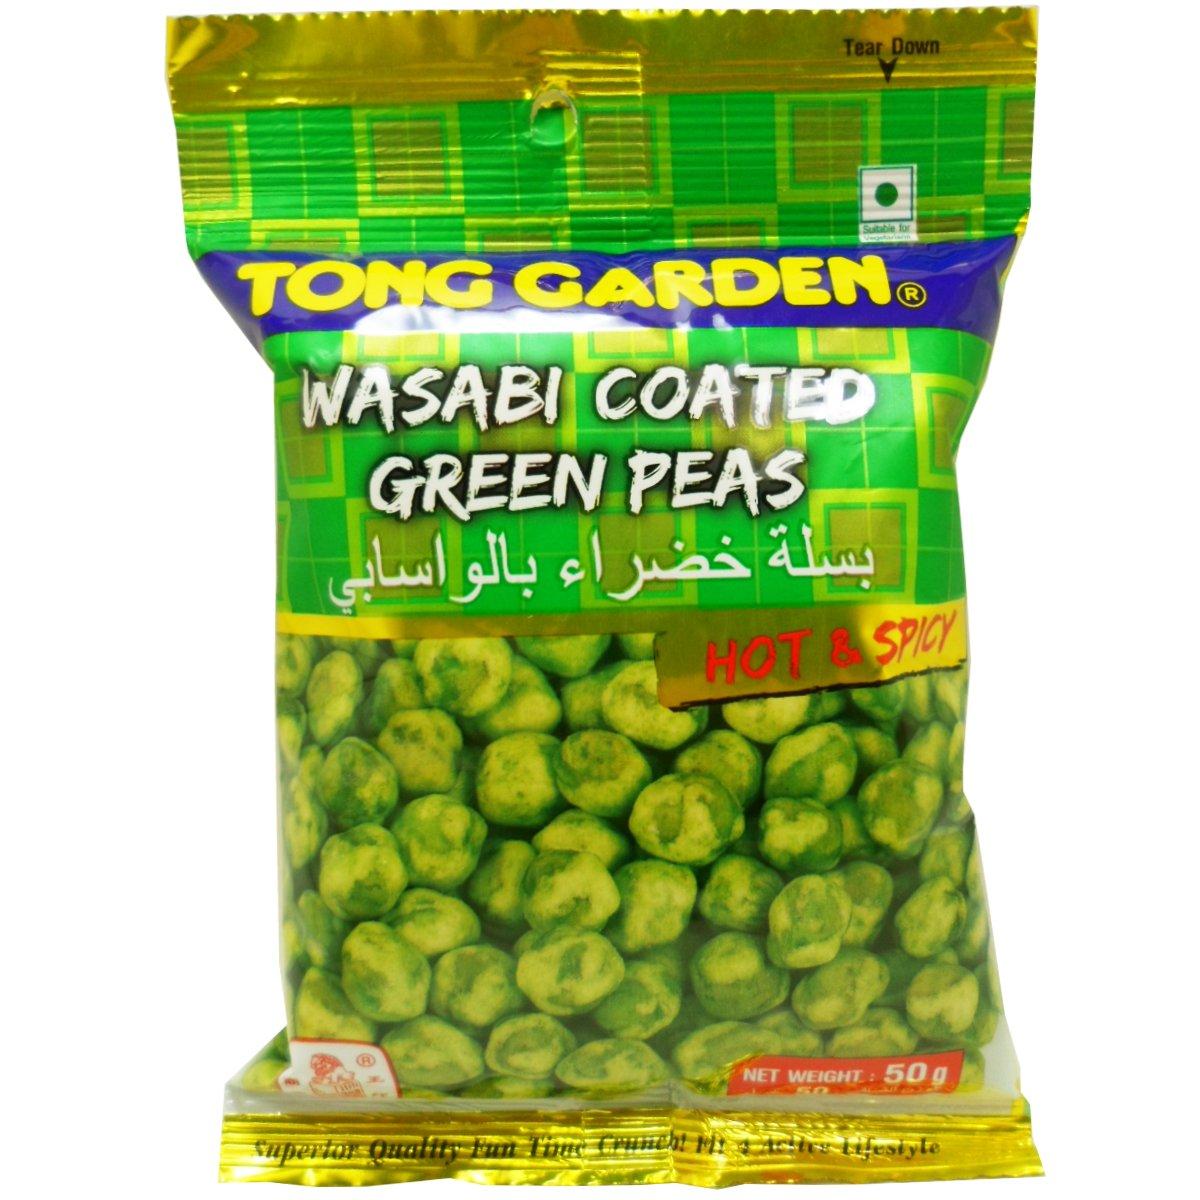 Crispy Wasabi Coating Green Peas Snack Hot & Spicy Net Wt 50 G (1.76 Oz.) Tong Garden Brand X 2 Bags